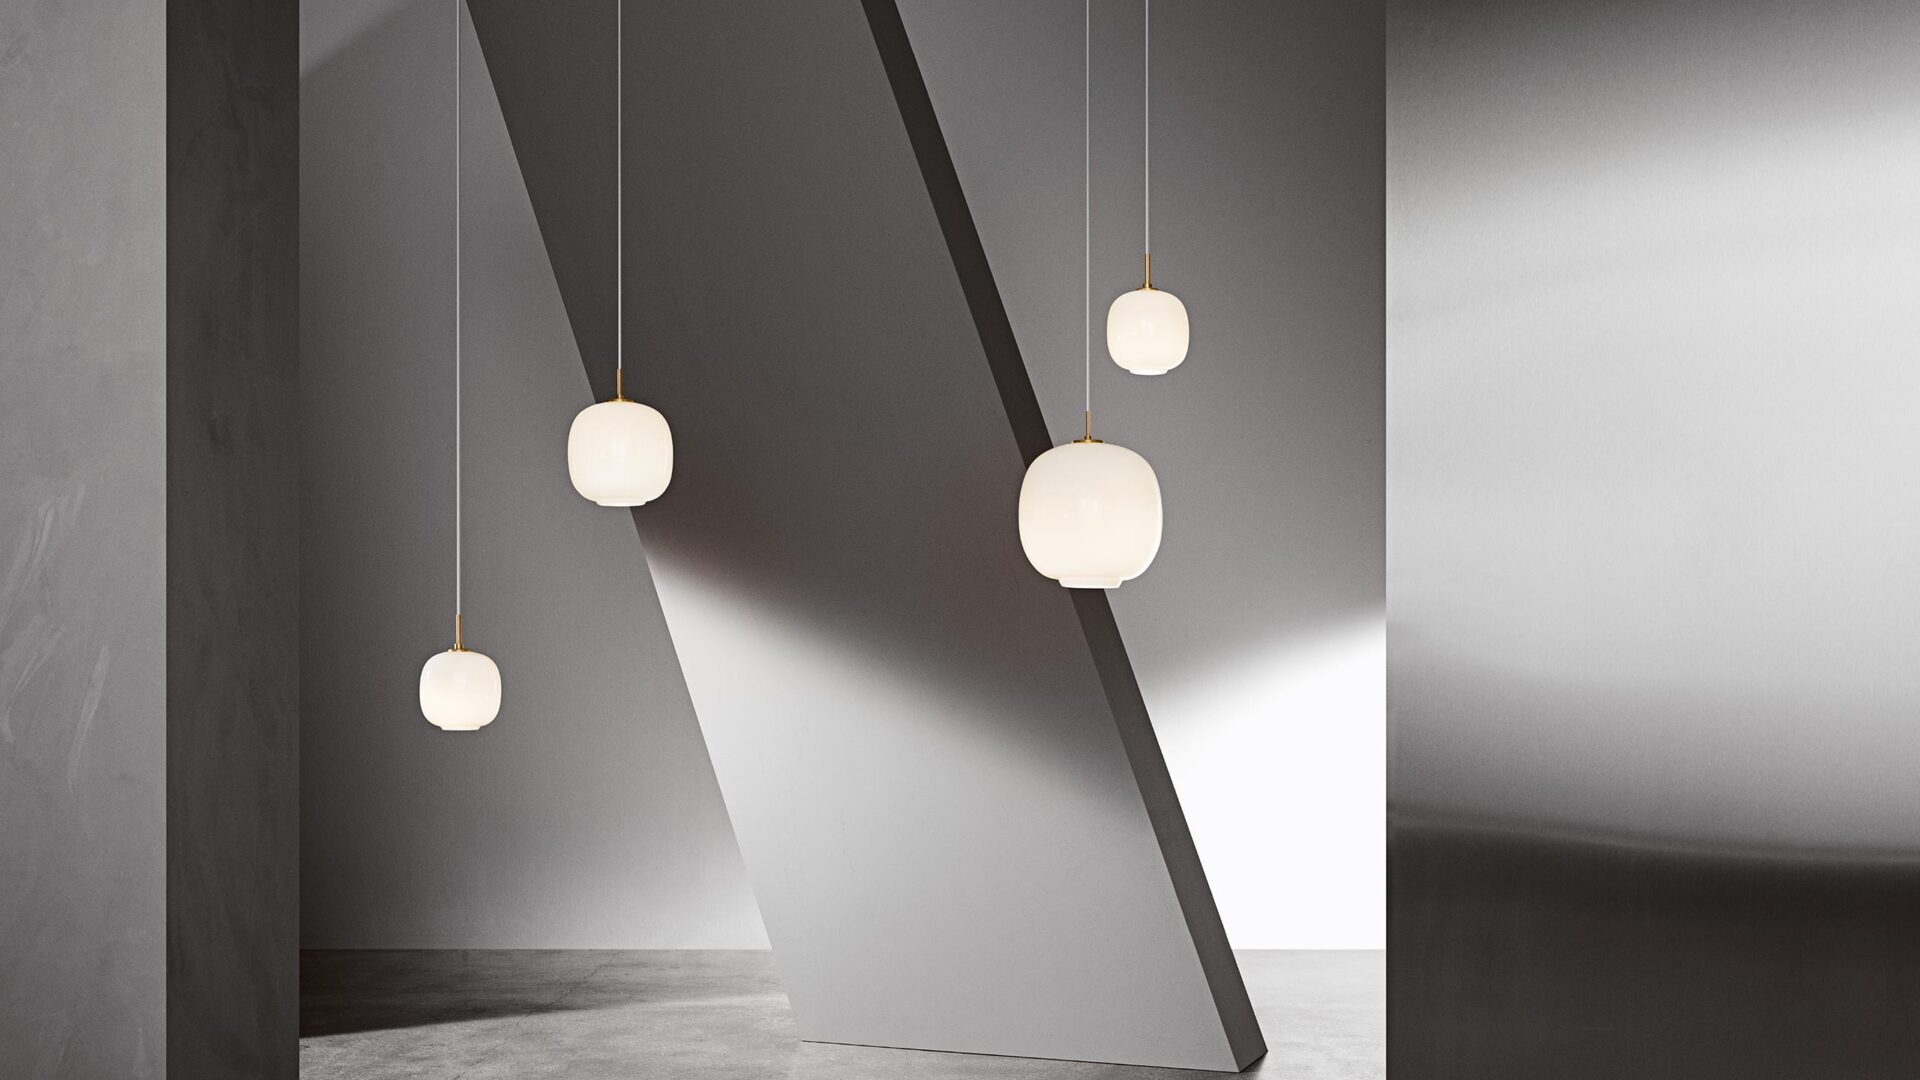 Louis Poulsen VL45 Deckenlampen